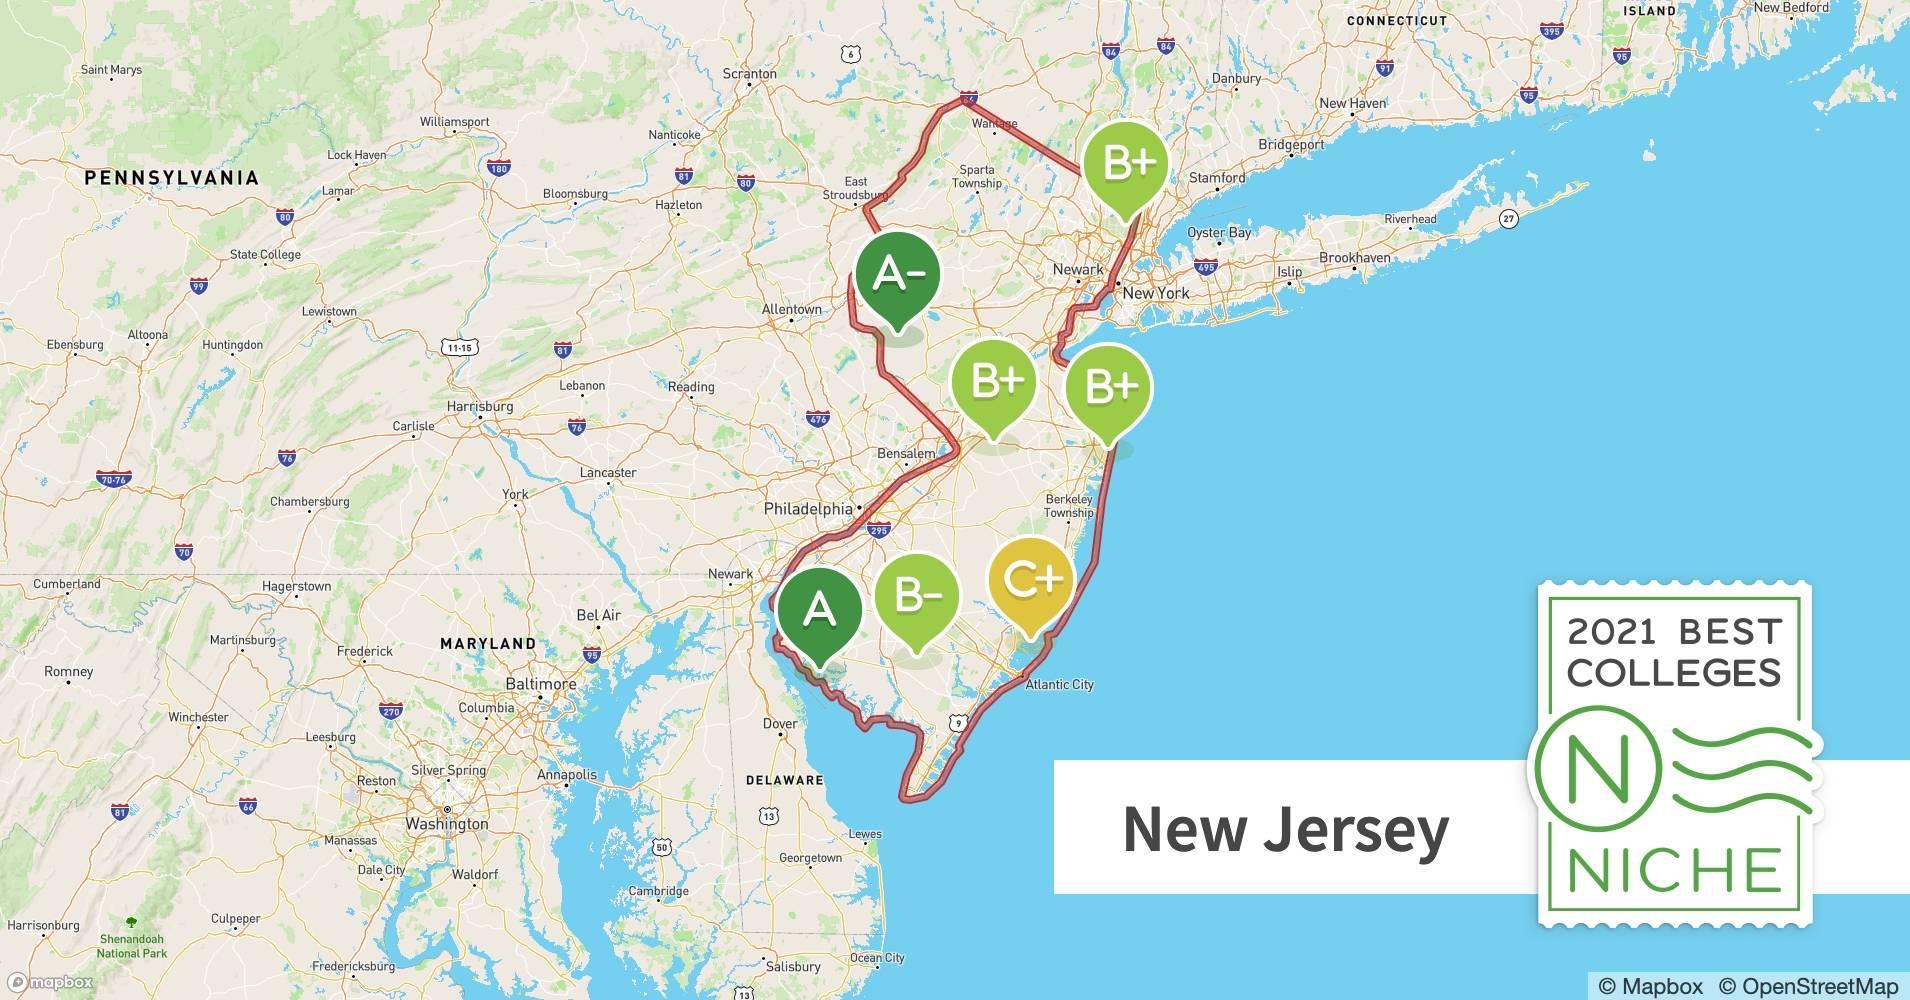 2021 Best Colleges In New Jersey Niche